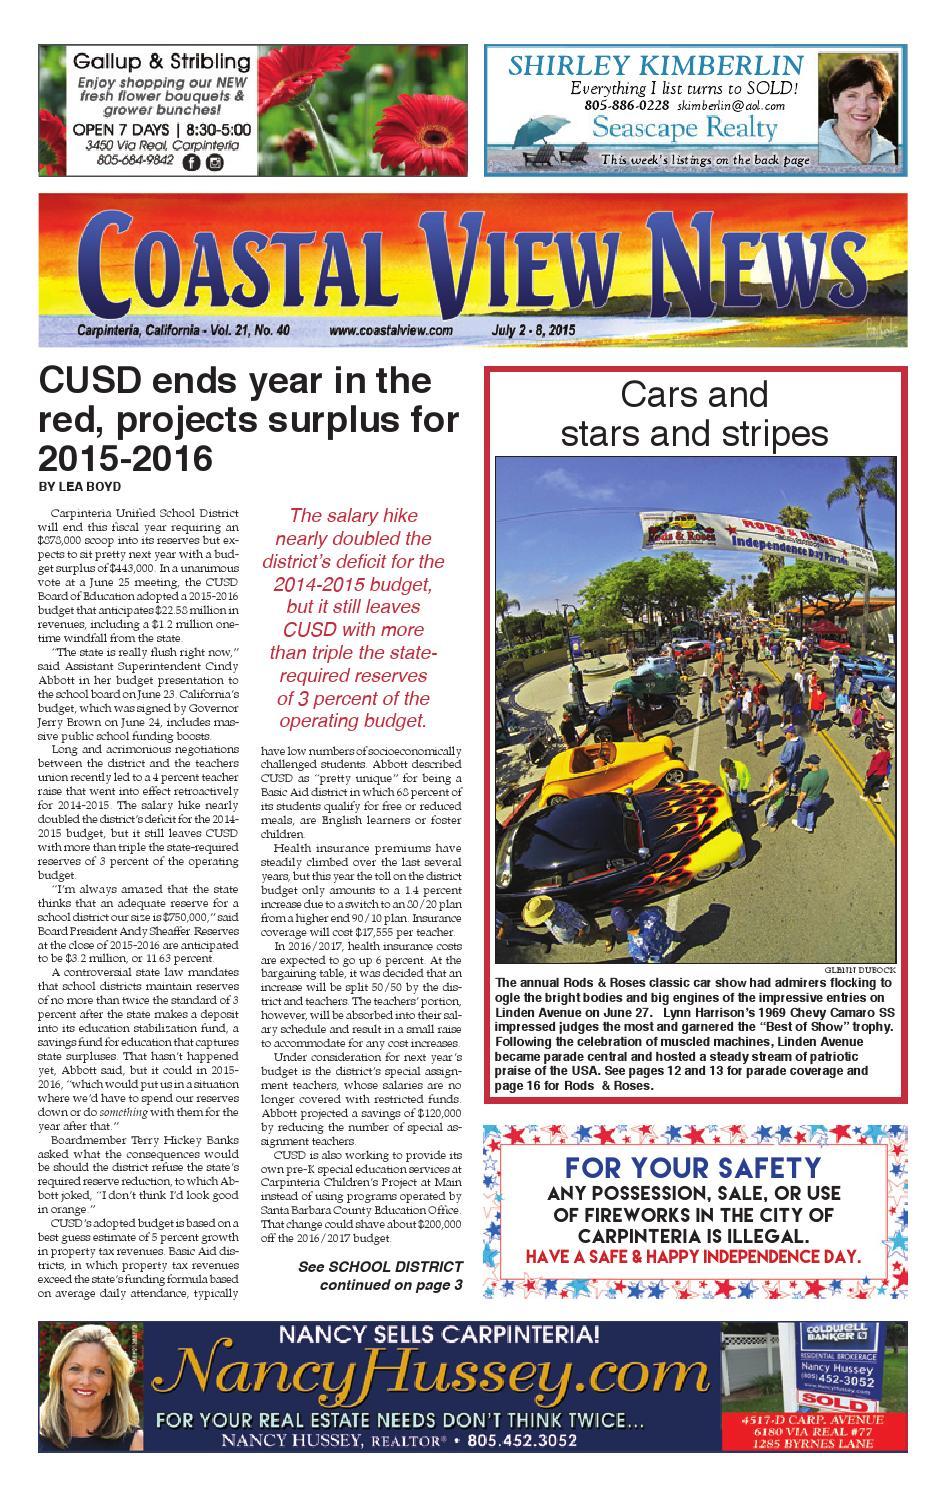 Cvn 070215 By Coastal View News Issuu Help My Generator Runs But I Don39t Have Any Power Roadtrek Blog